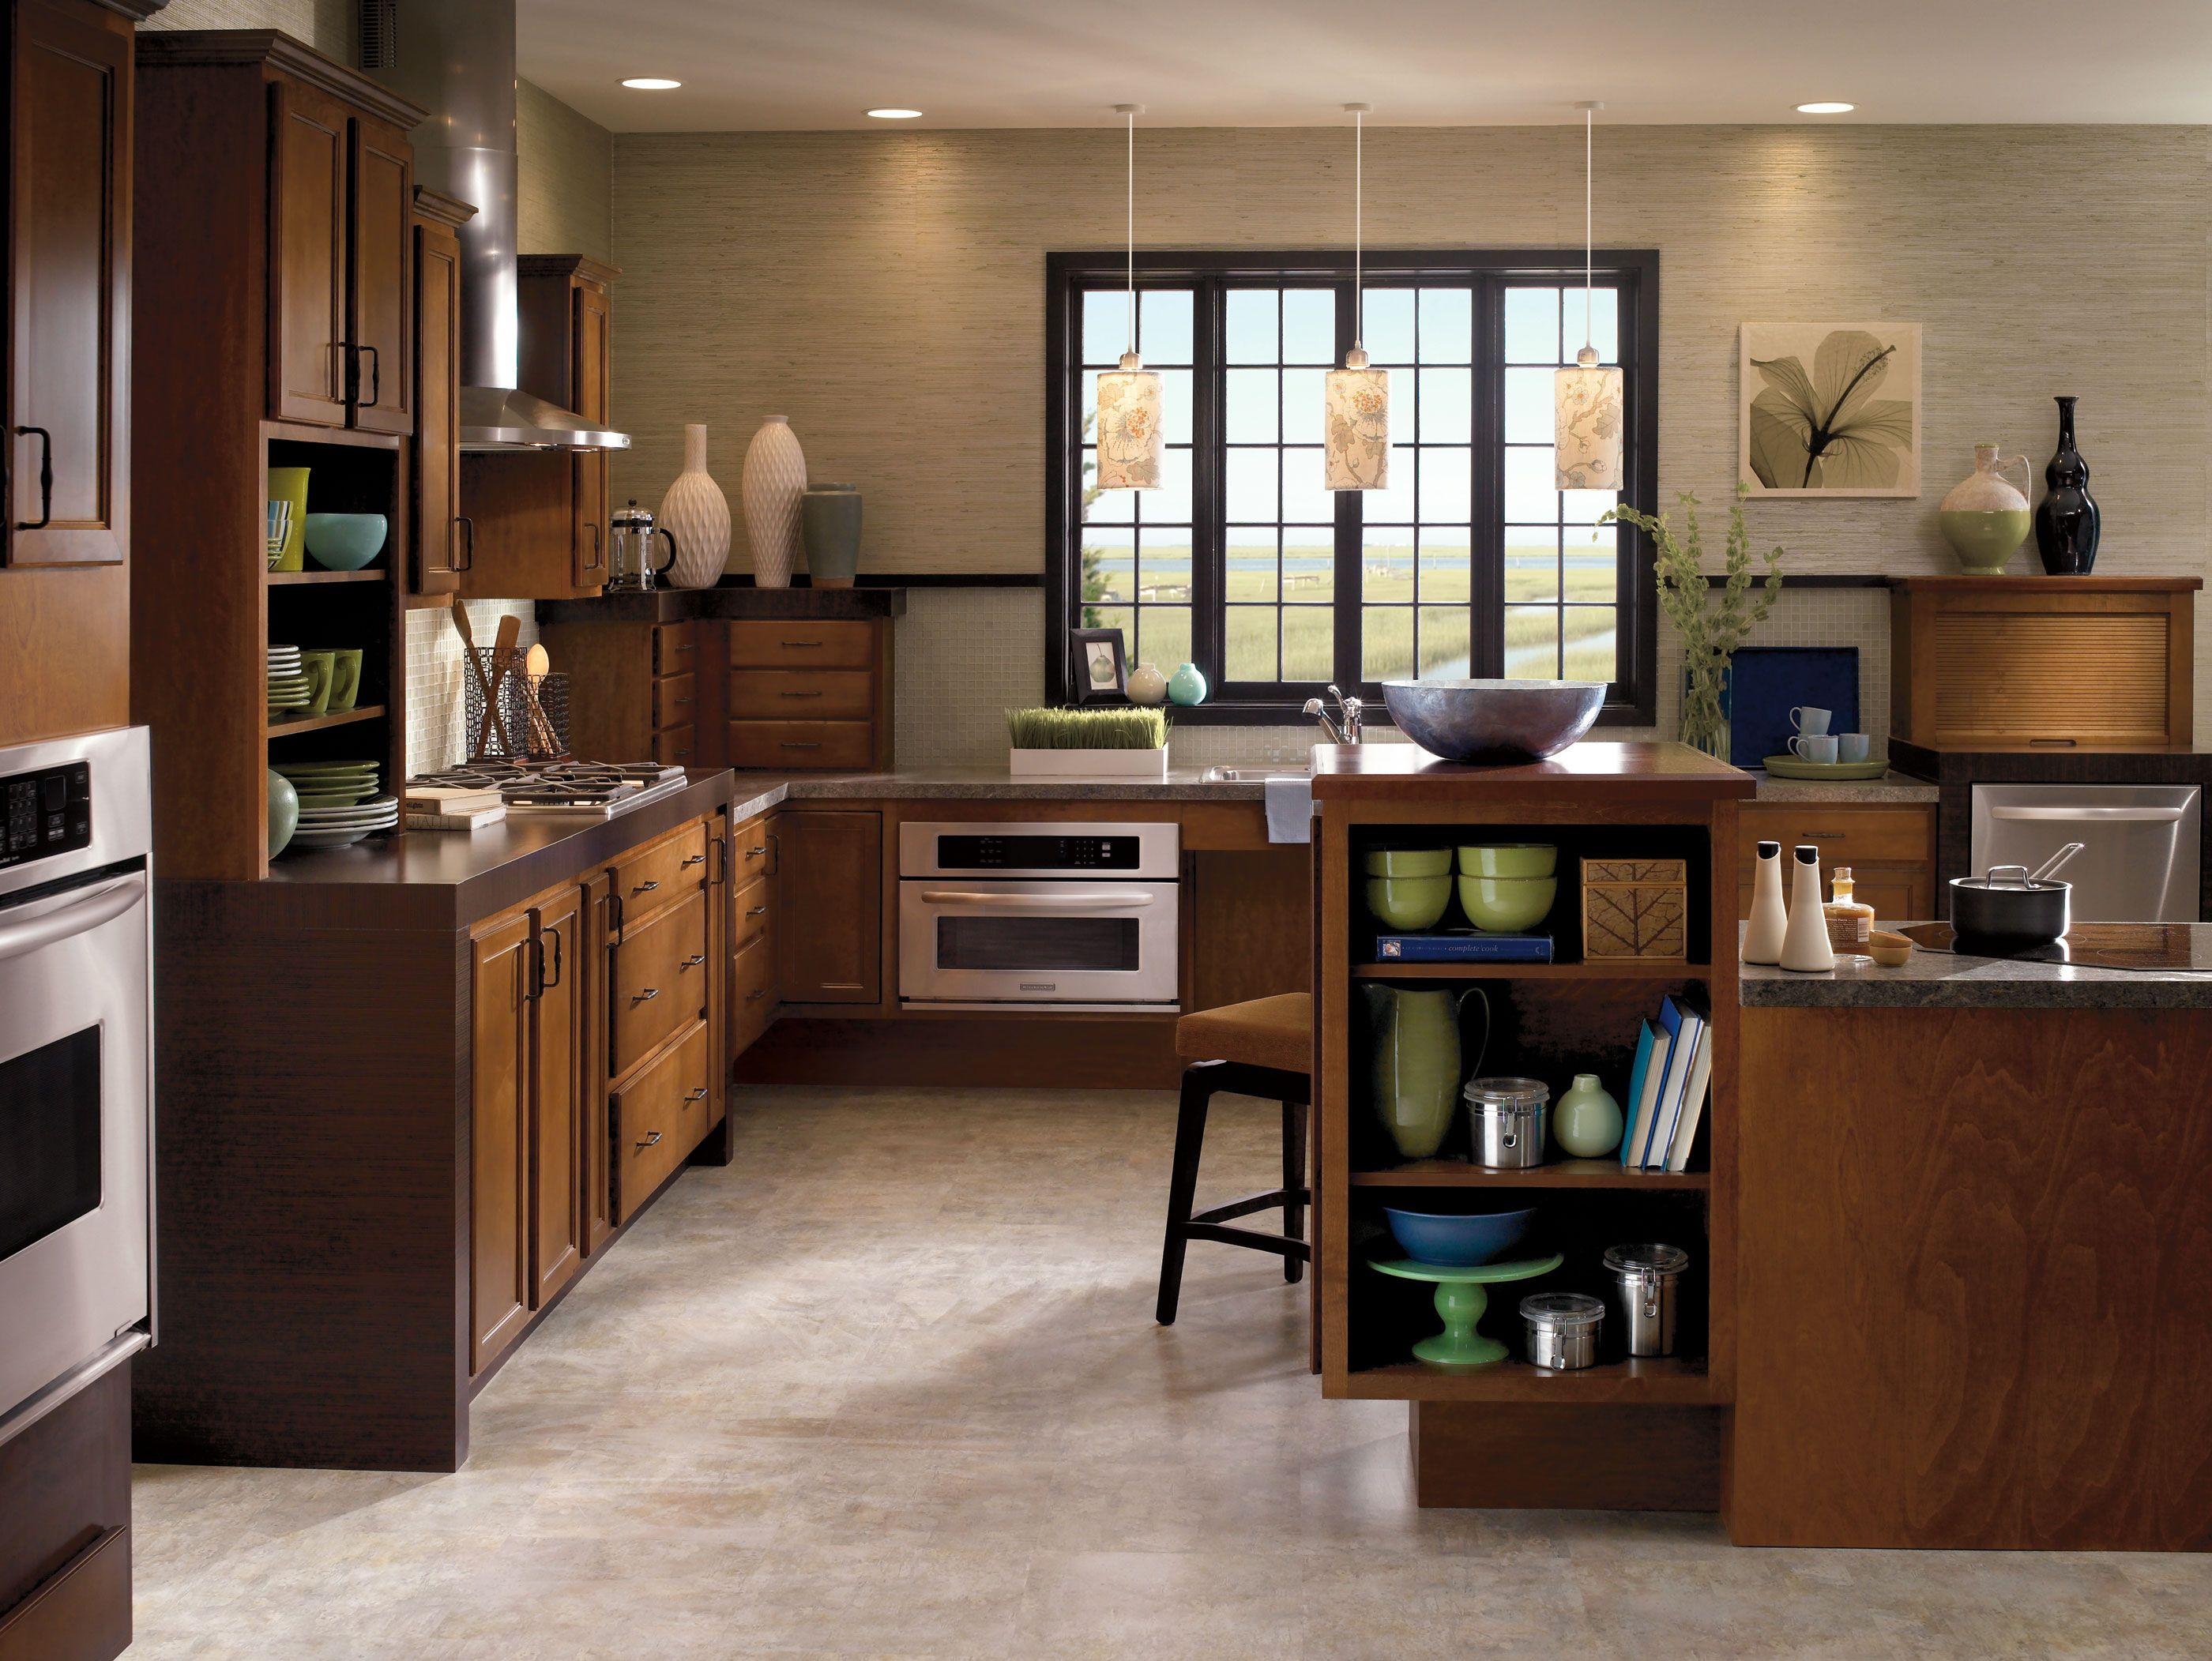 Aristokraft takes every element of your kitchen design